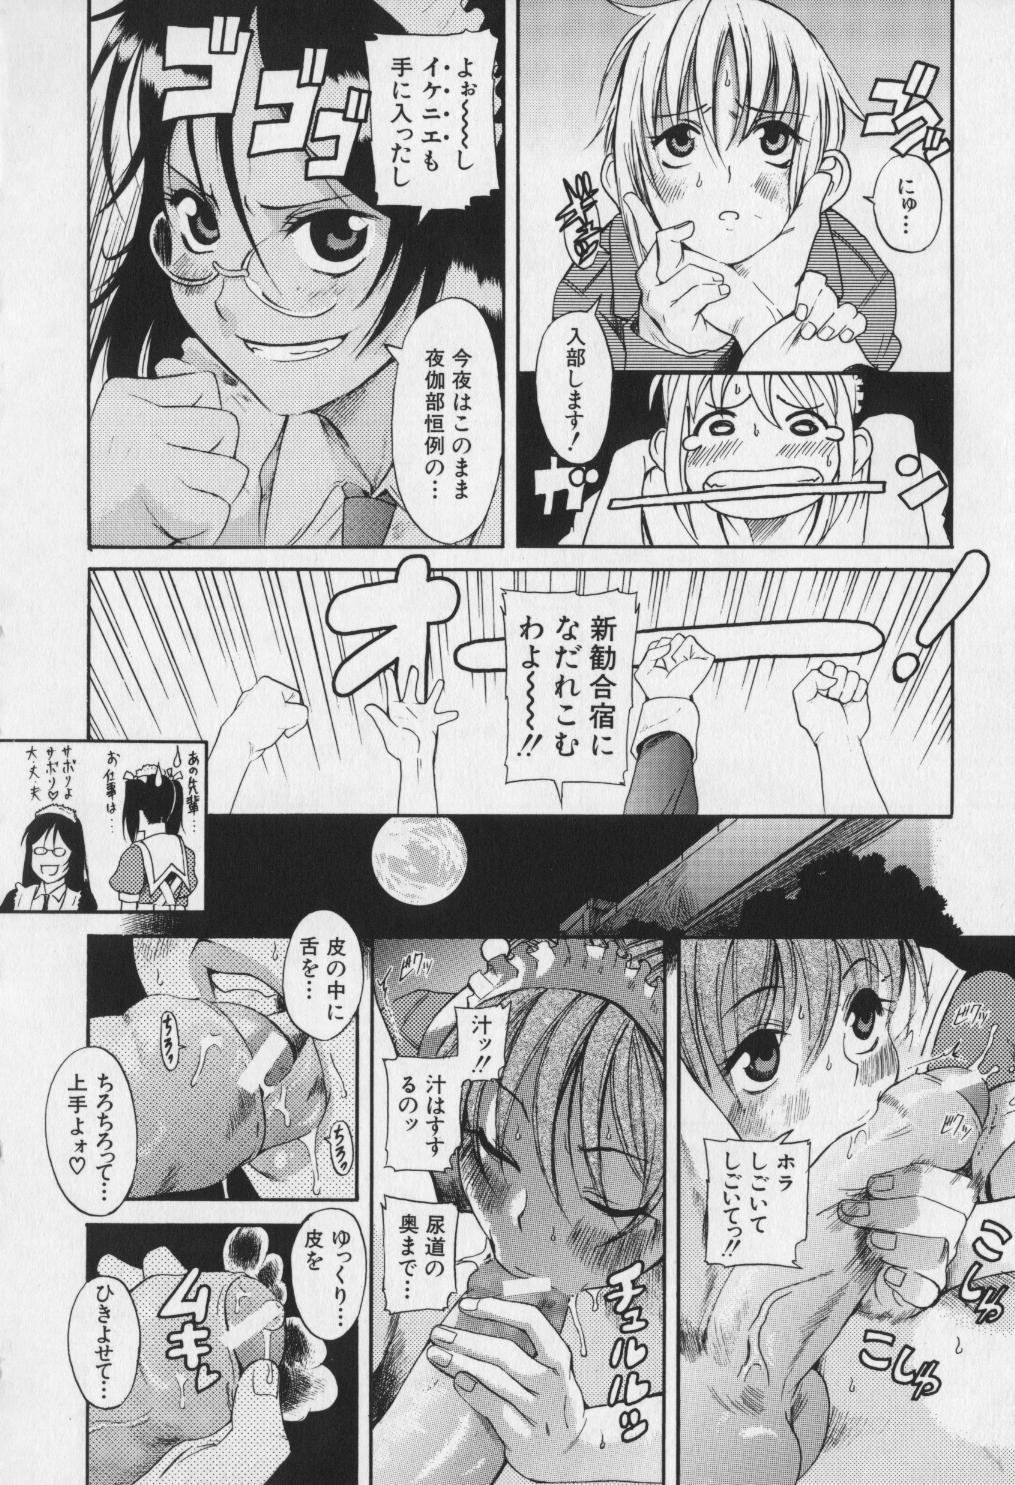 Kimi no Na o Yobeba - If I call your name. 28